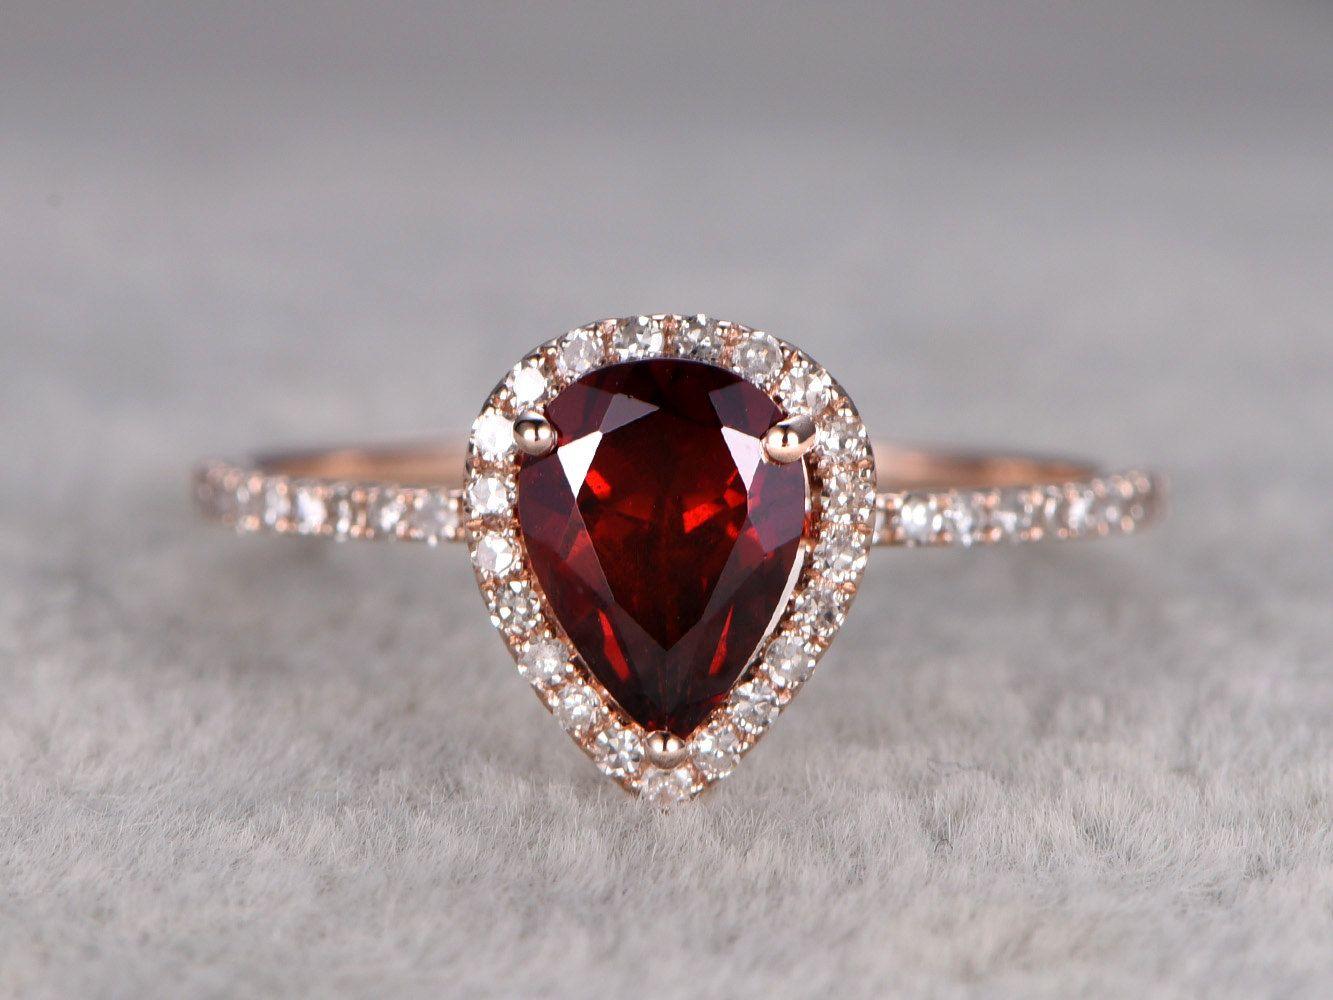 a3e3f55934a66 1.2ct Pear Cut Red Garnet Engagement ring Rose gold,Diamond wedding ...